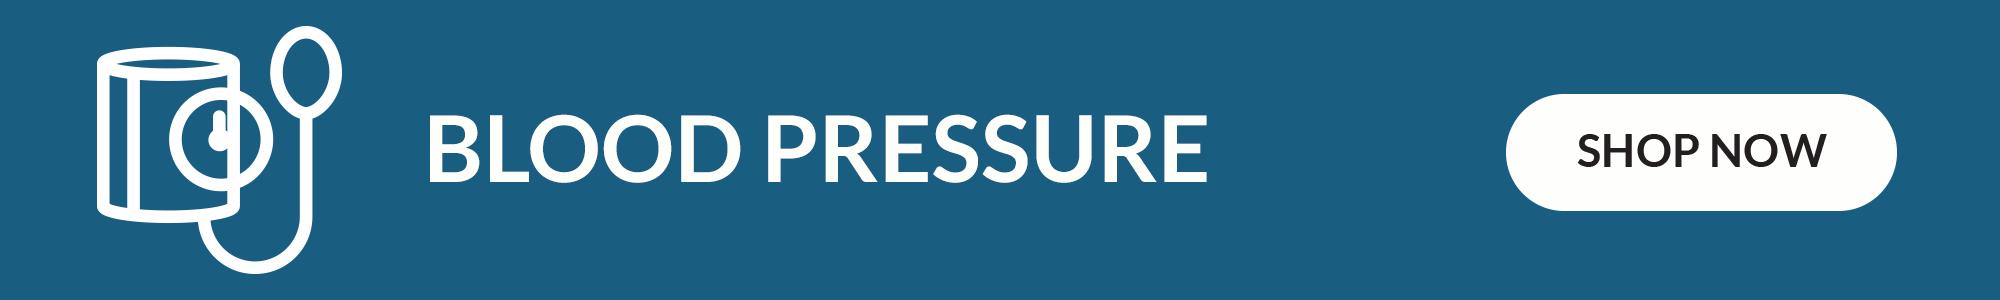 blood-pressure-header.png